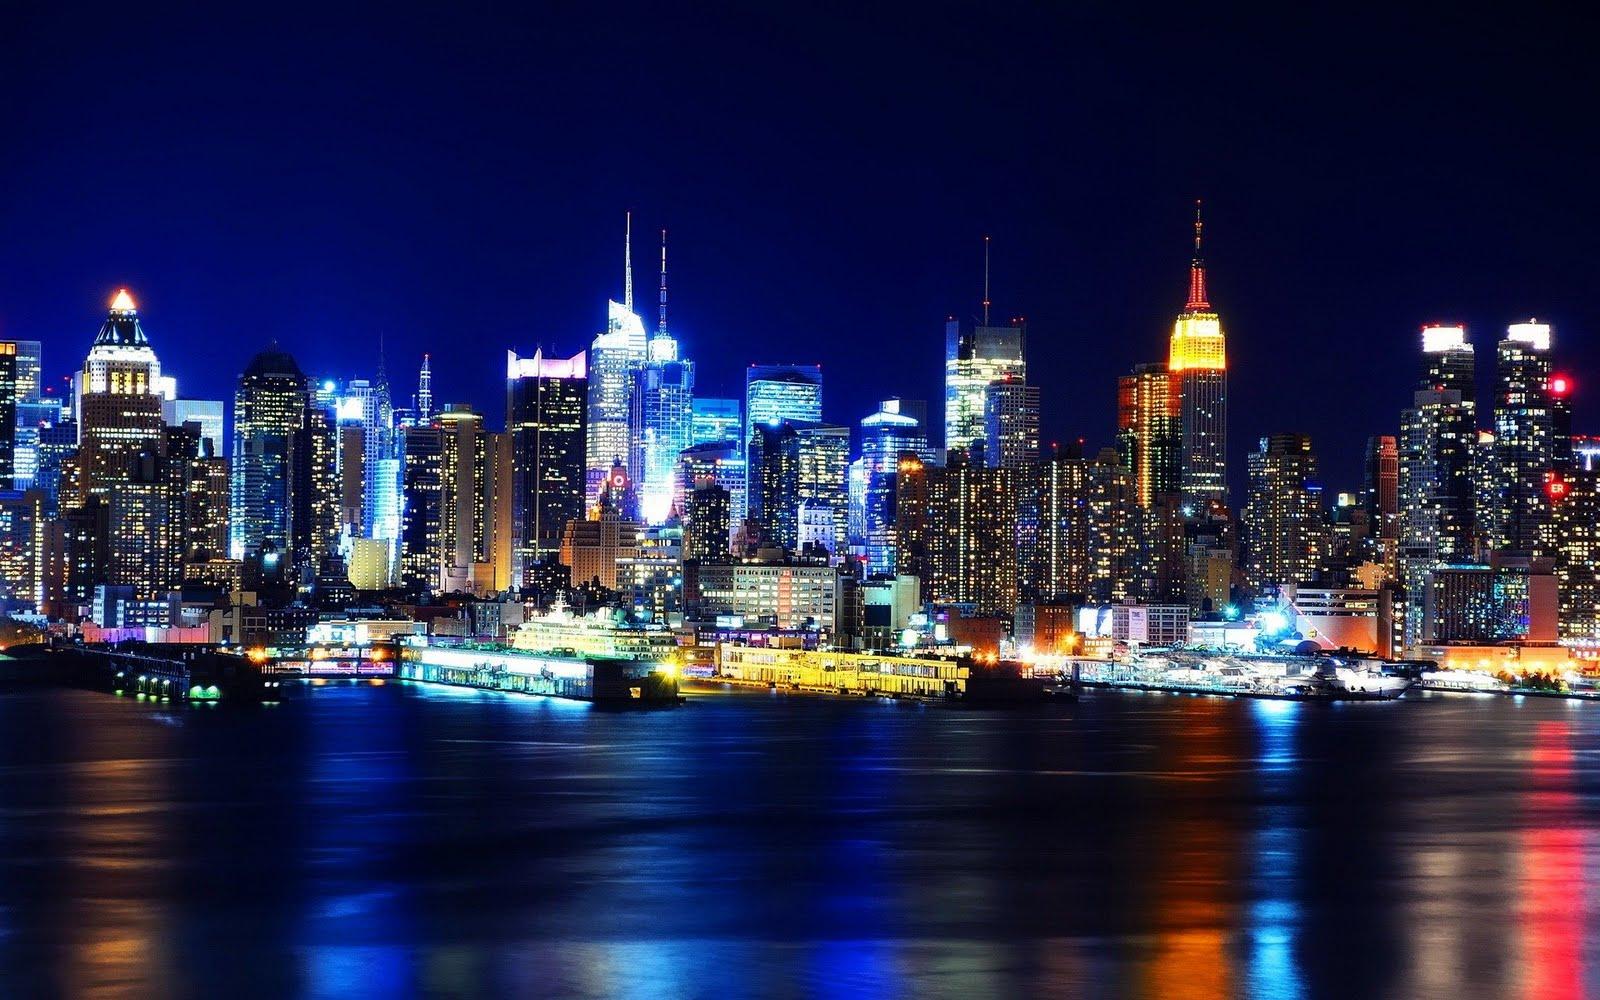 york wallpaper new york night wallpaper new york city wallpaper 1600x1000